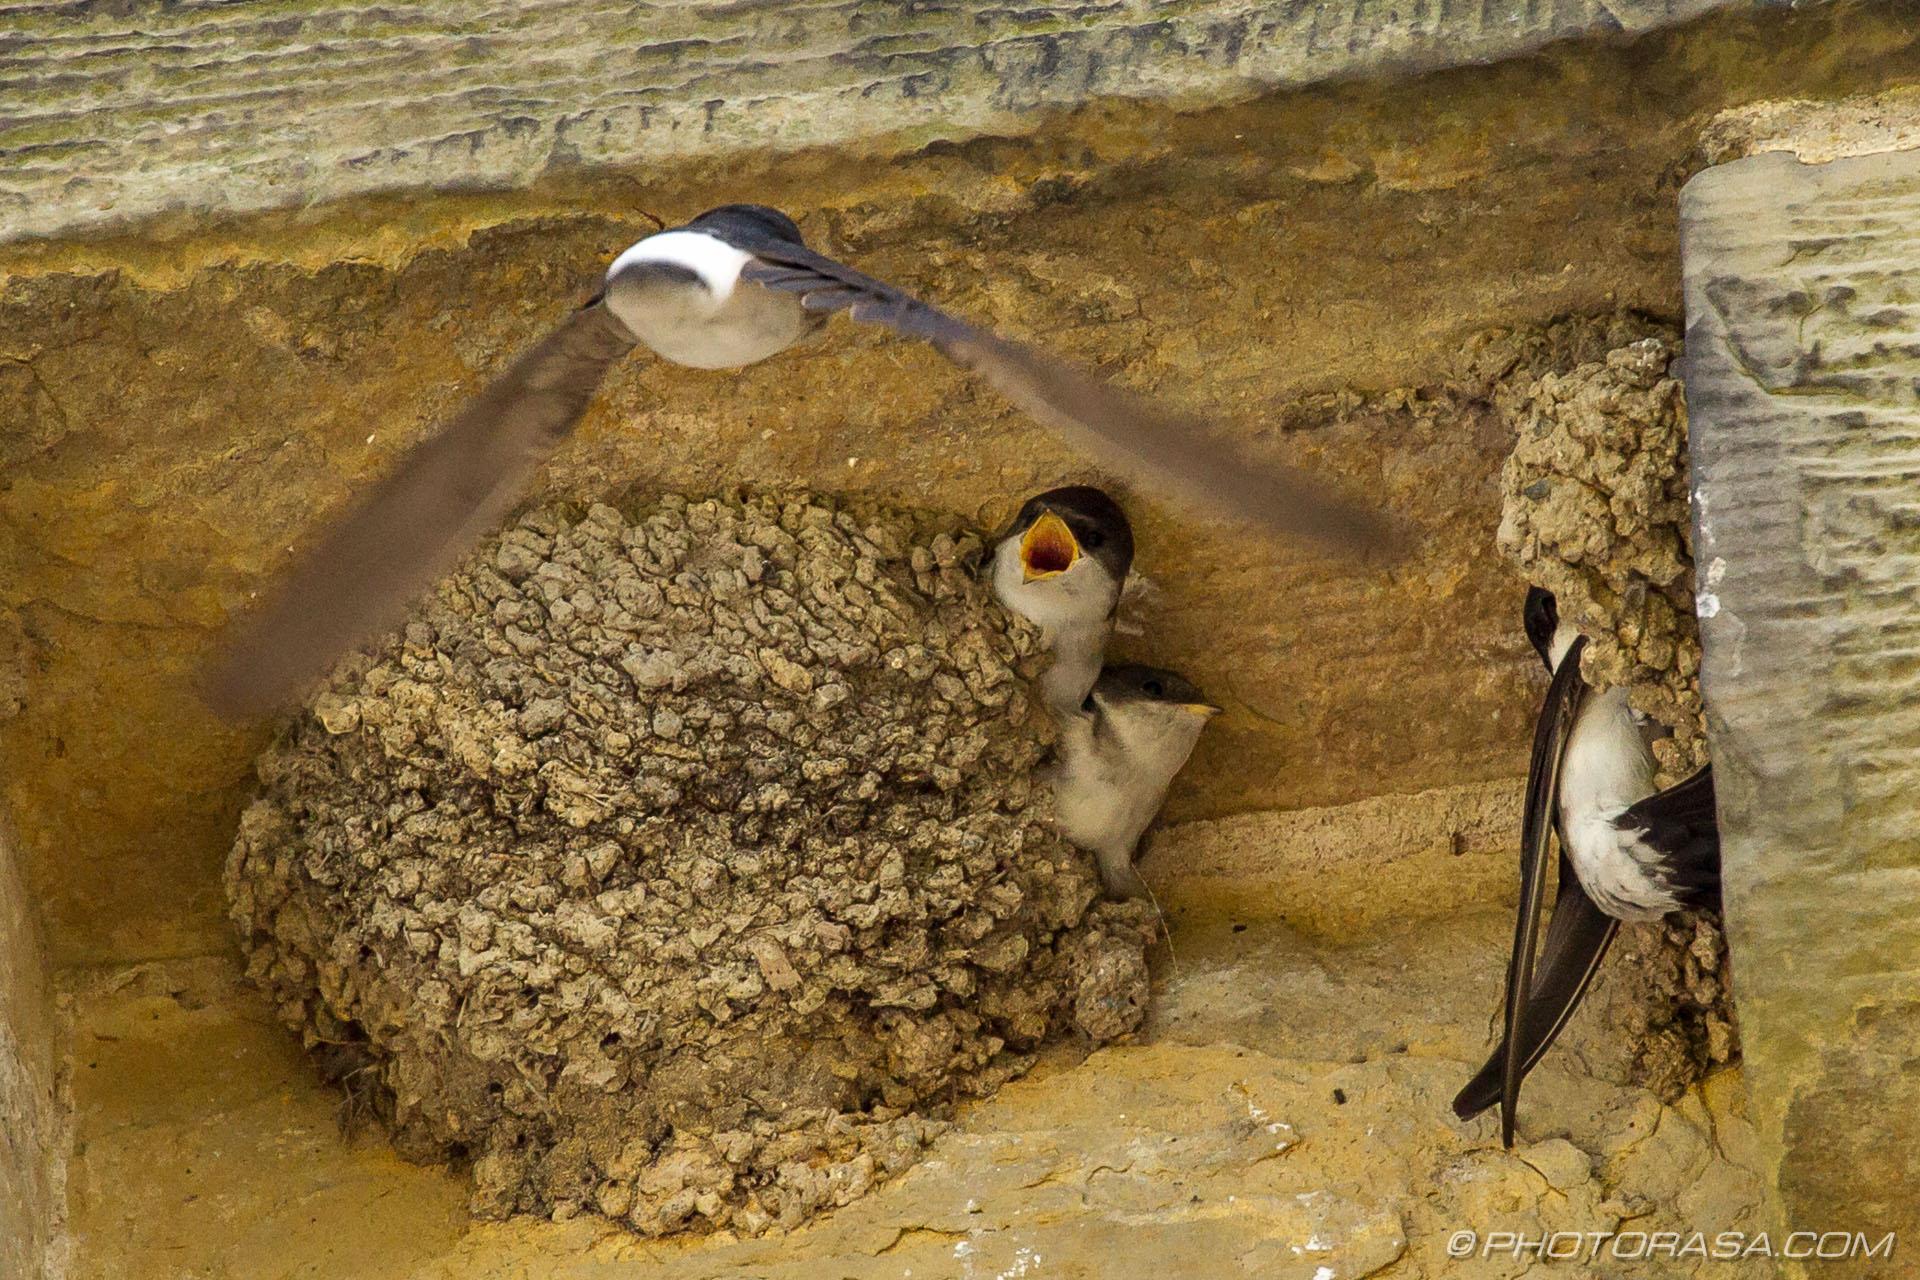 http://photorasa.com/family-house-martins-nesting/housemartin-returning-to-family-and-nest-in-midflight/